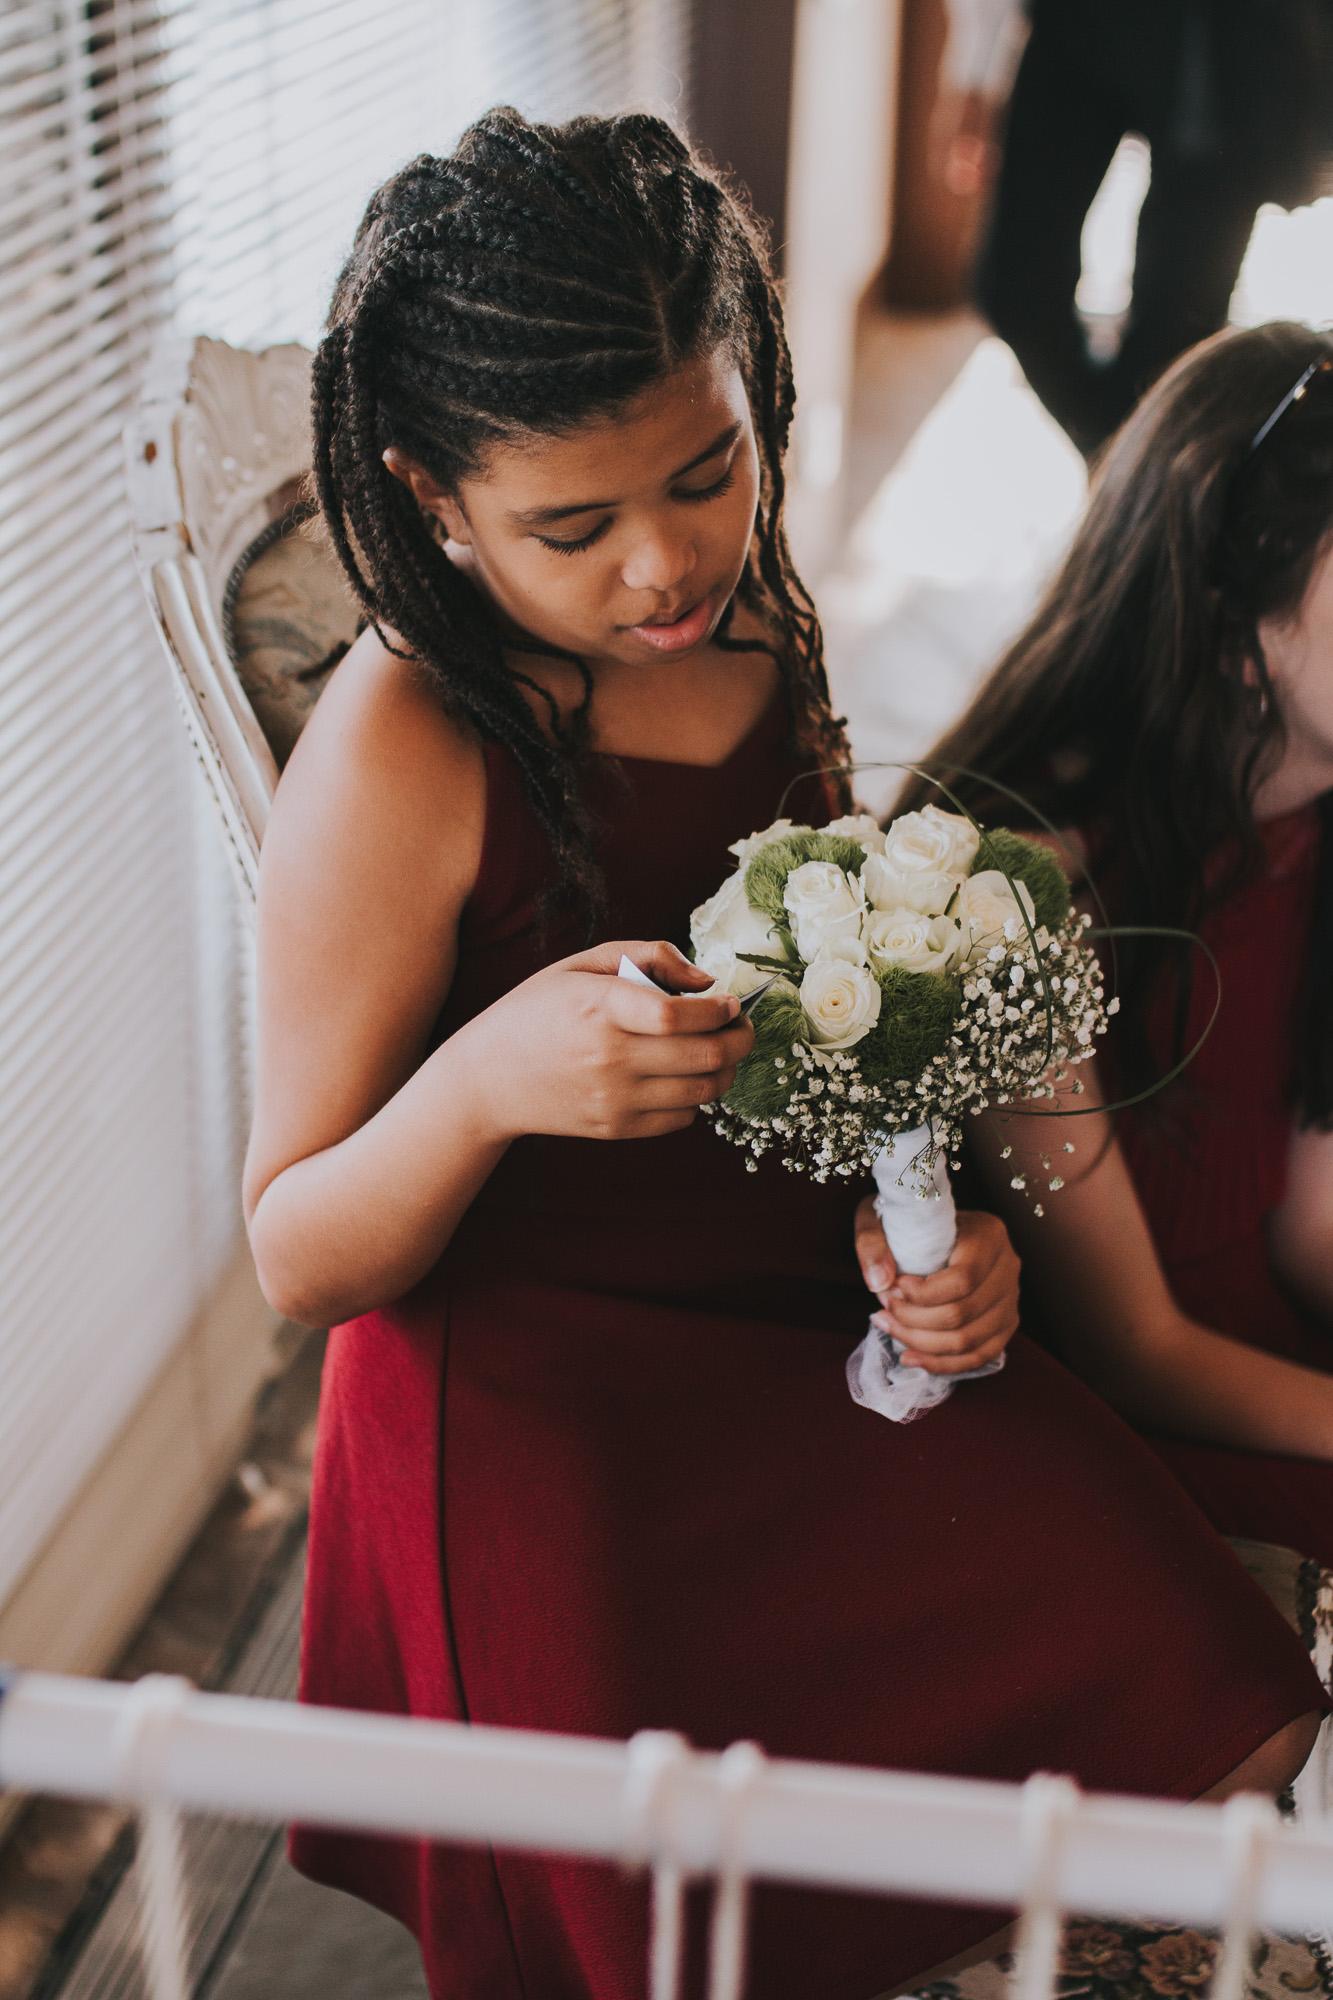 20180720-Memoryfactory-Sara&Jacopo-103- Hochzeit.jpg